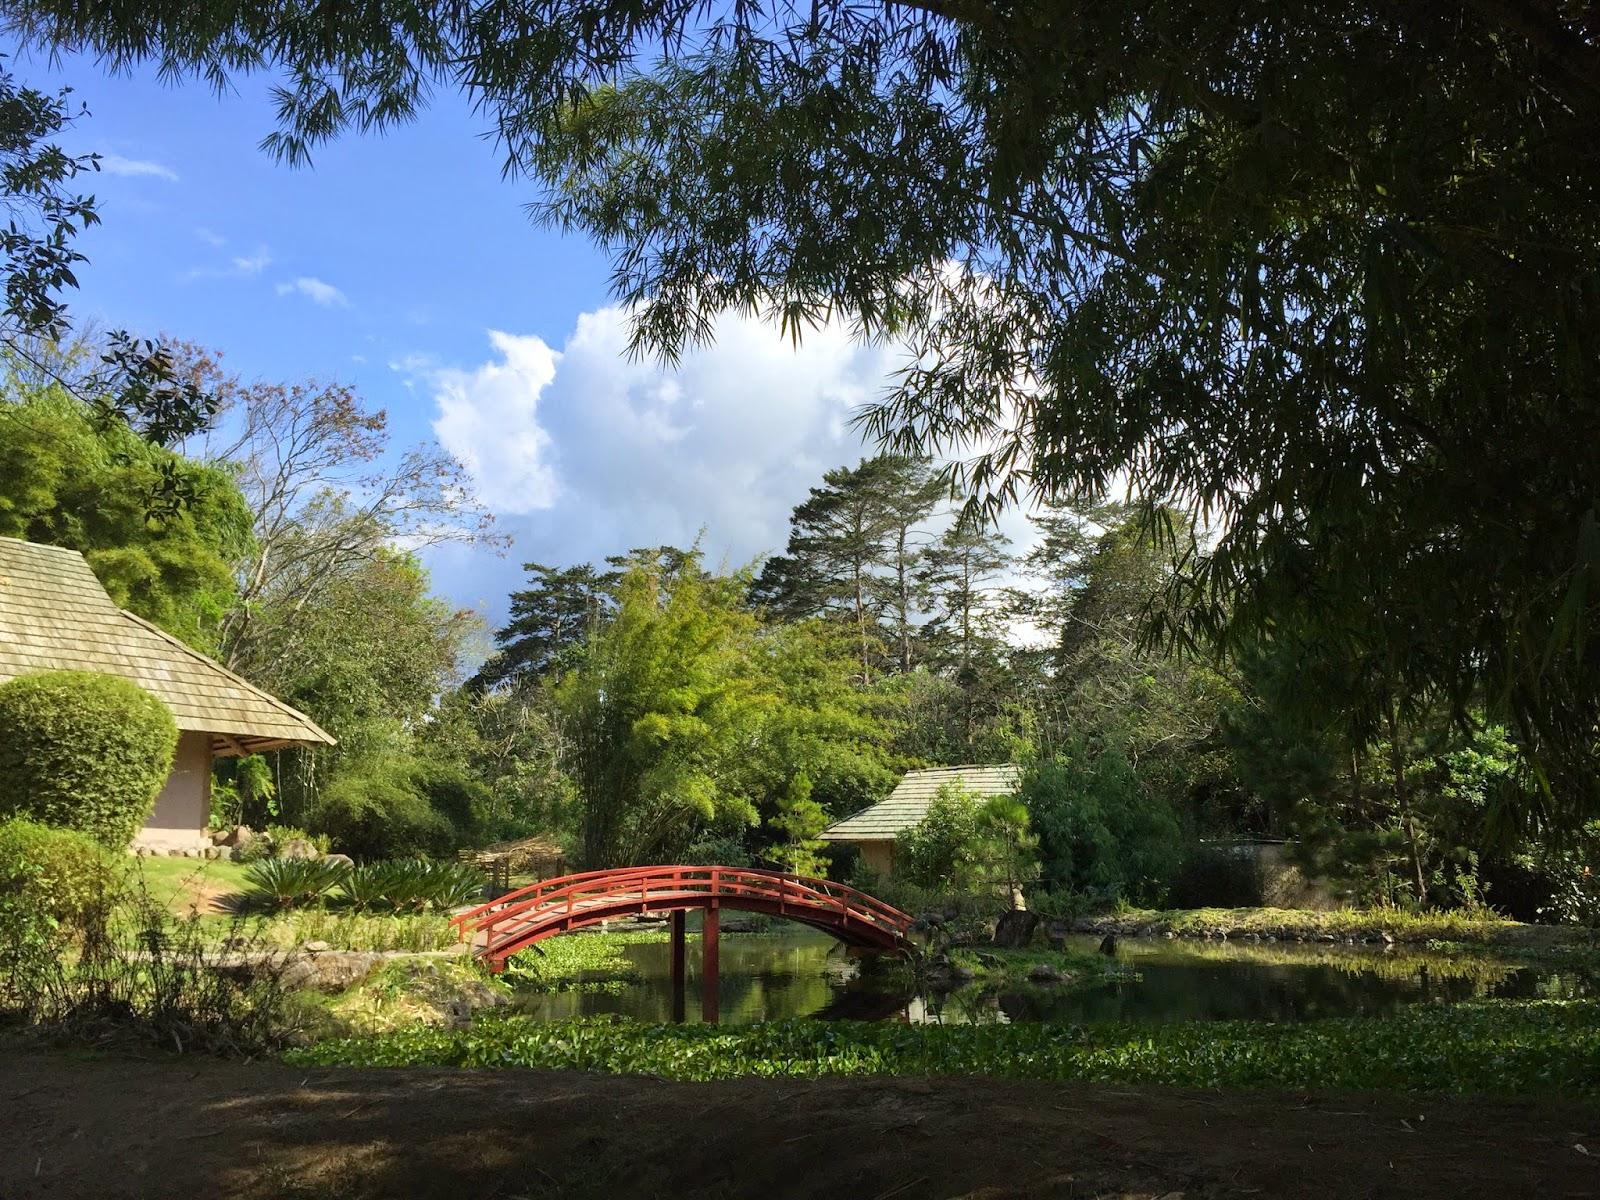 Mis Aventuras En Costa Rica February 2015